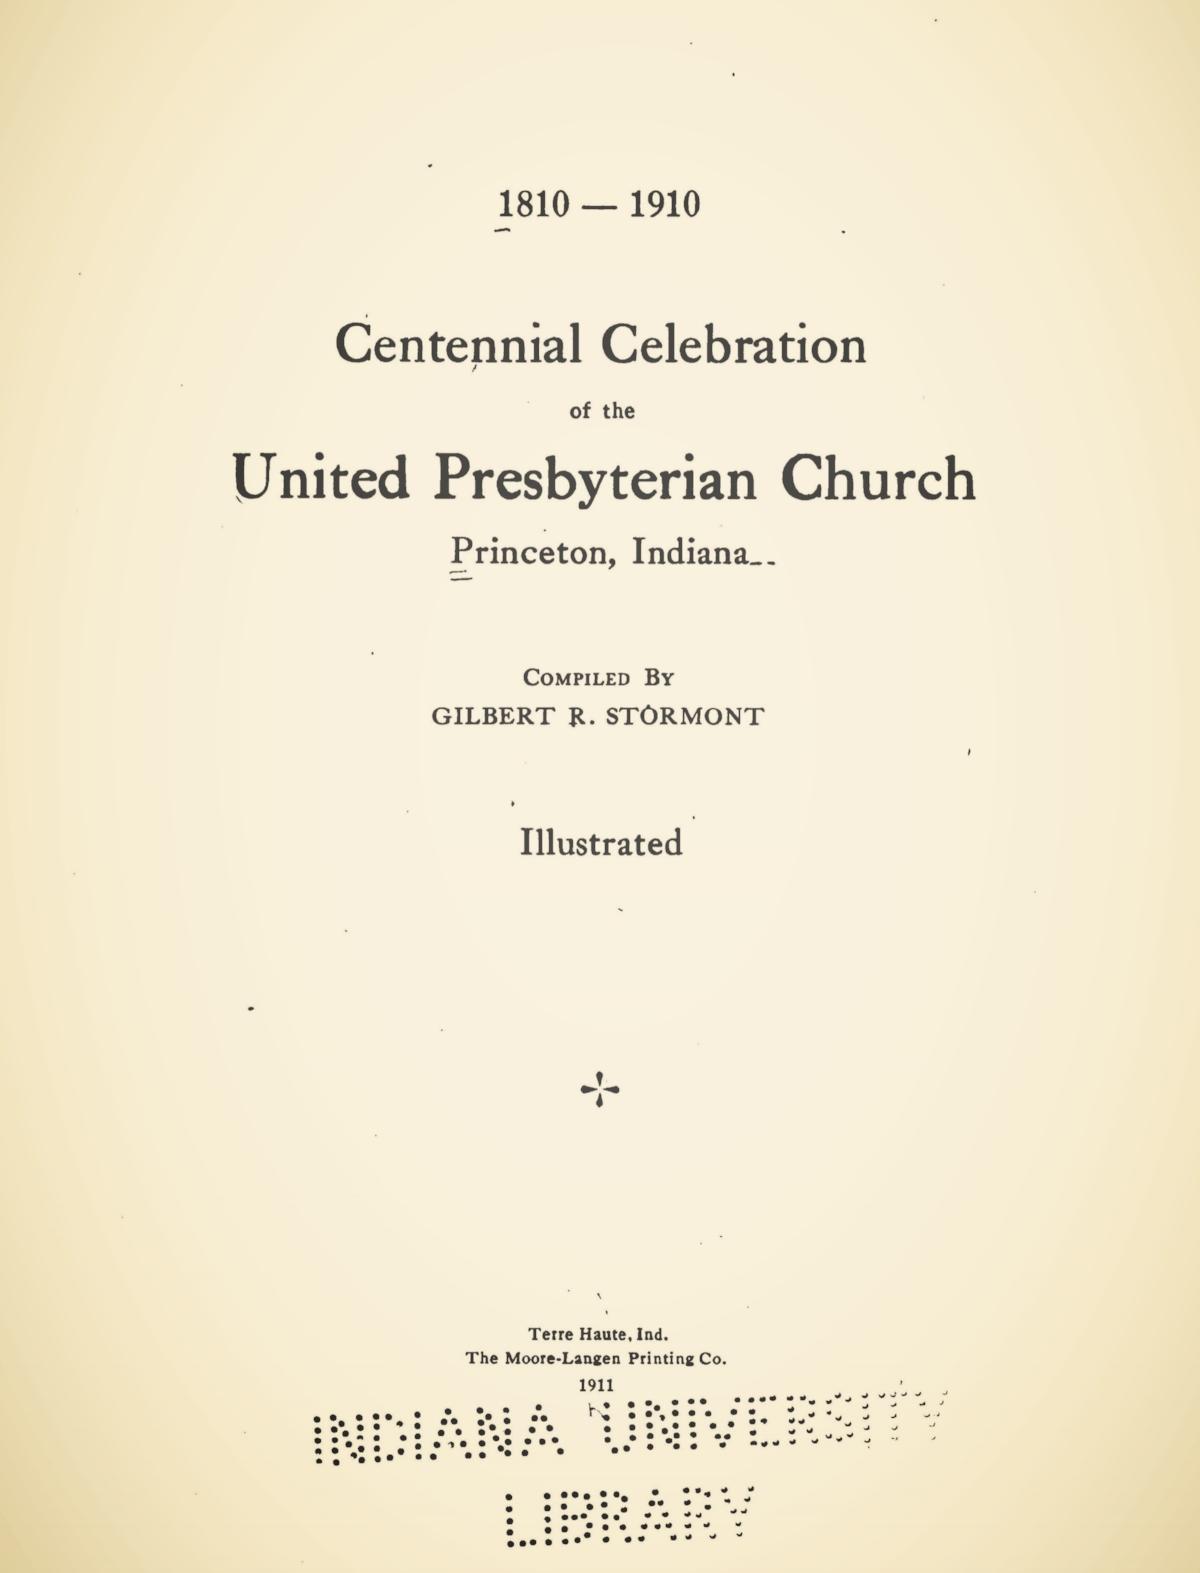 Stormont, Gilbert Robert, Centennial Celebration of the United Presbyterian Church, Princeton, Indiana Title Page.jpg